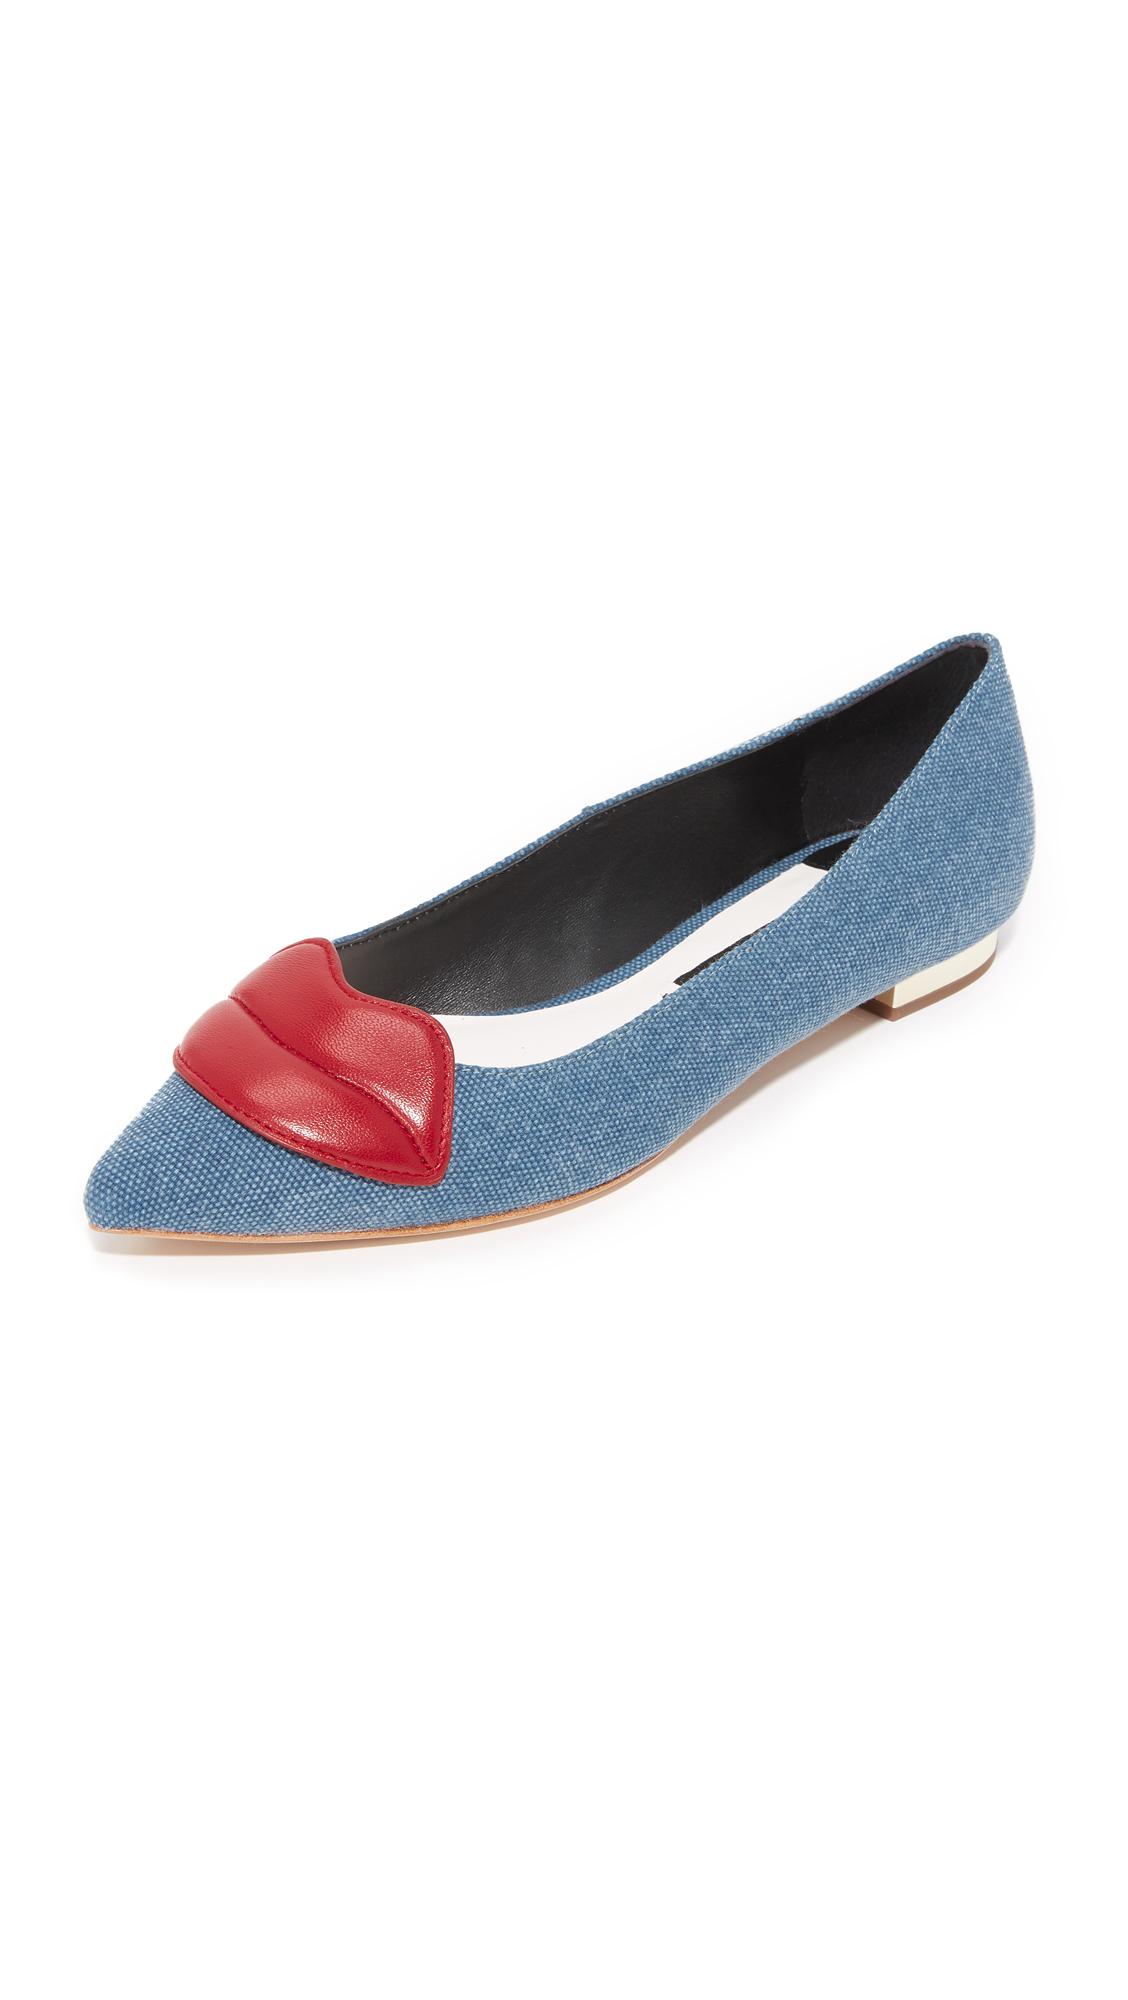 Photo of Alice + Olivia Kaylee Lips Flats Blue Denim - alice + olivia online